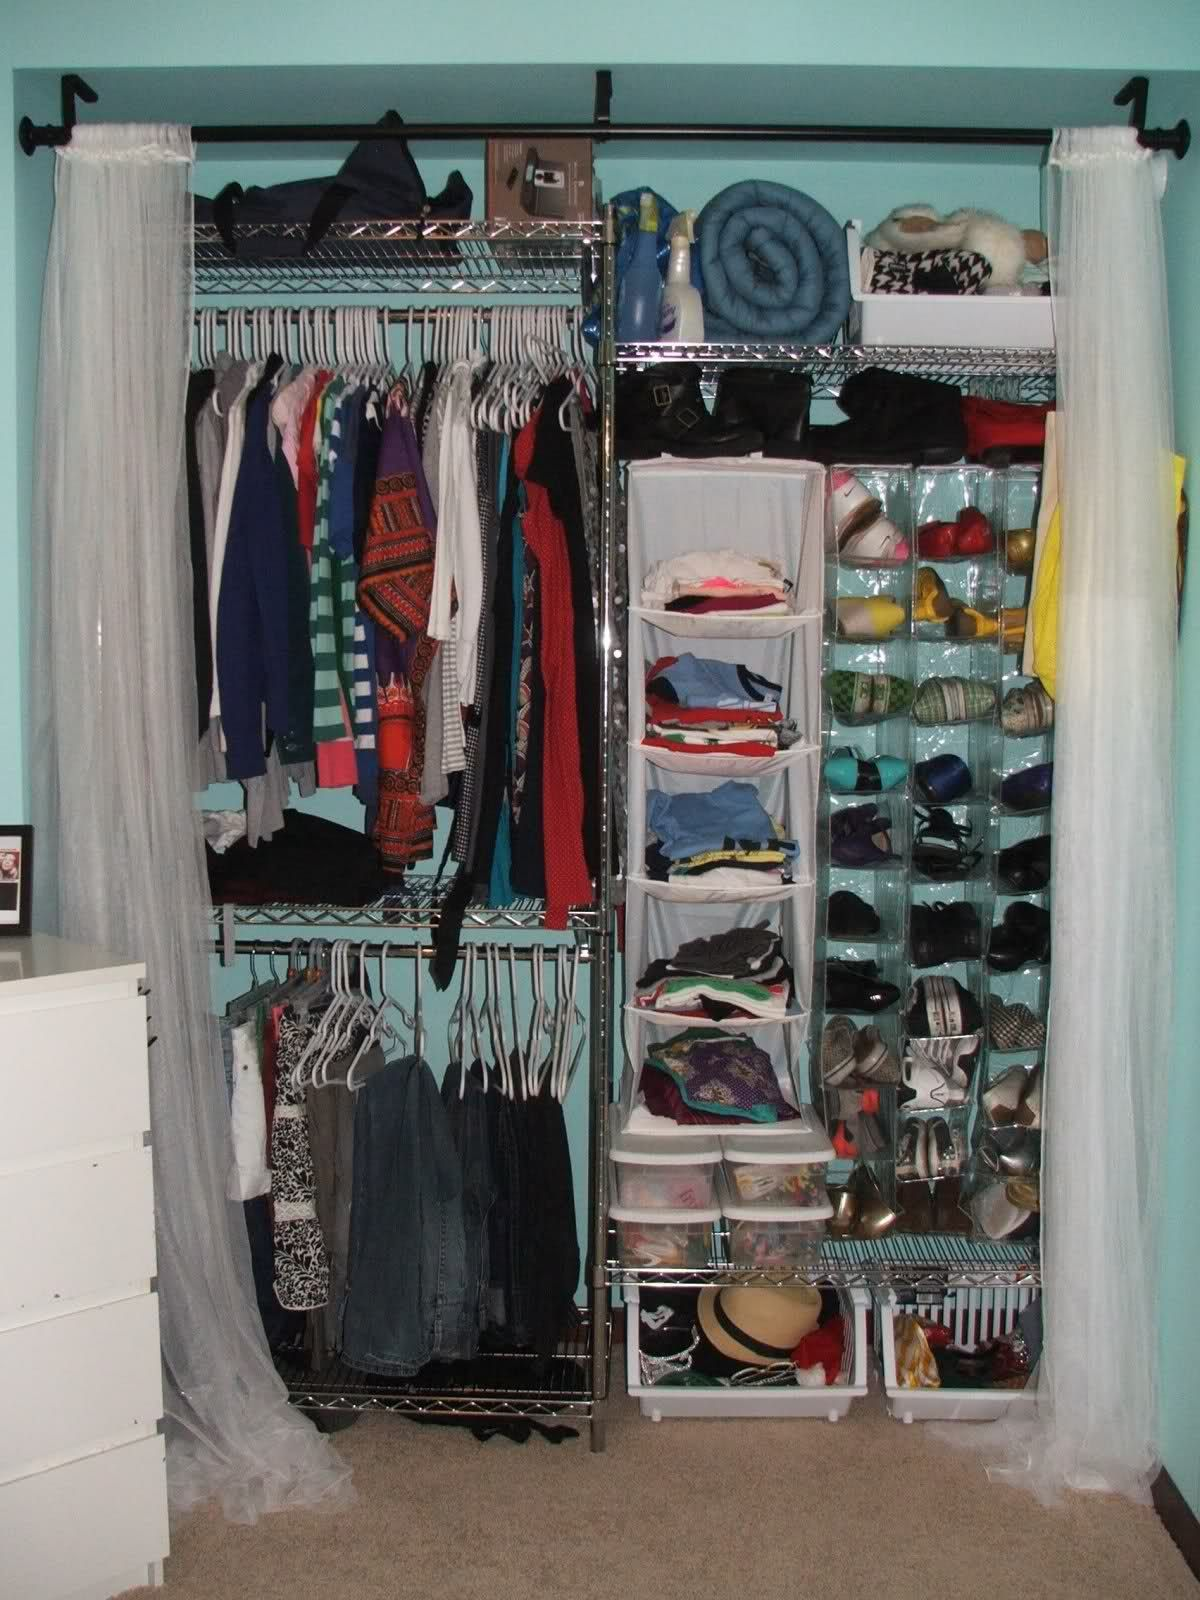 Dorm Room Ideas For Girls Organization Storage Closet Space